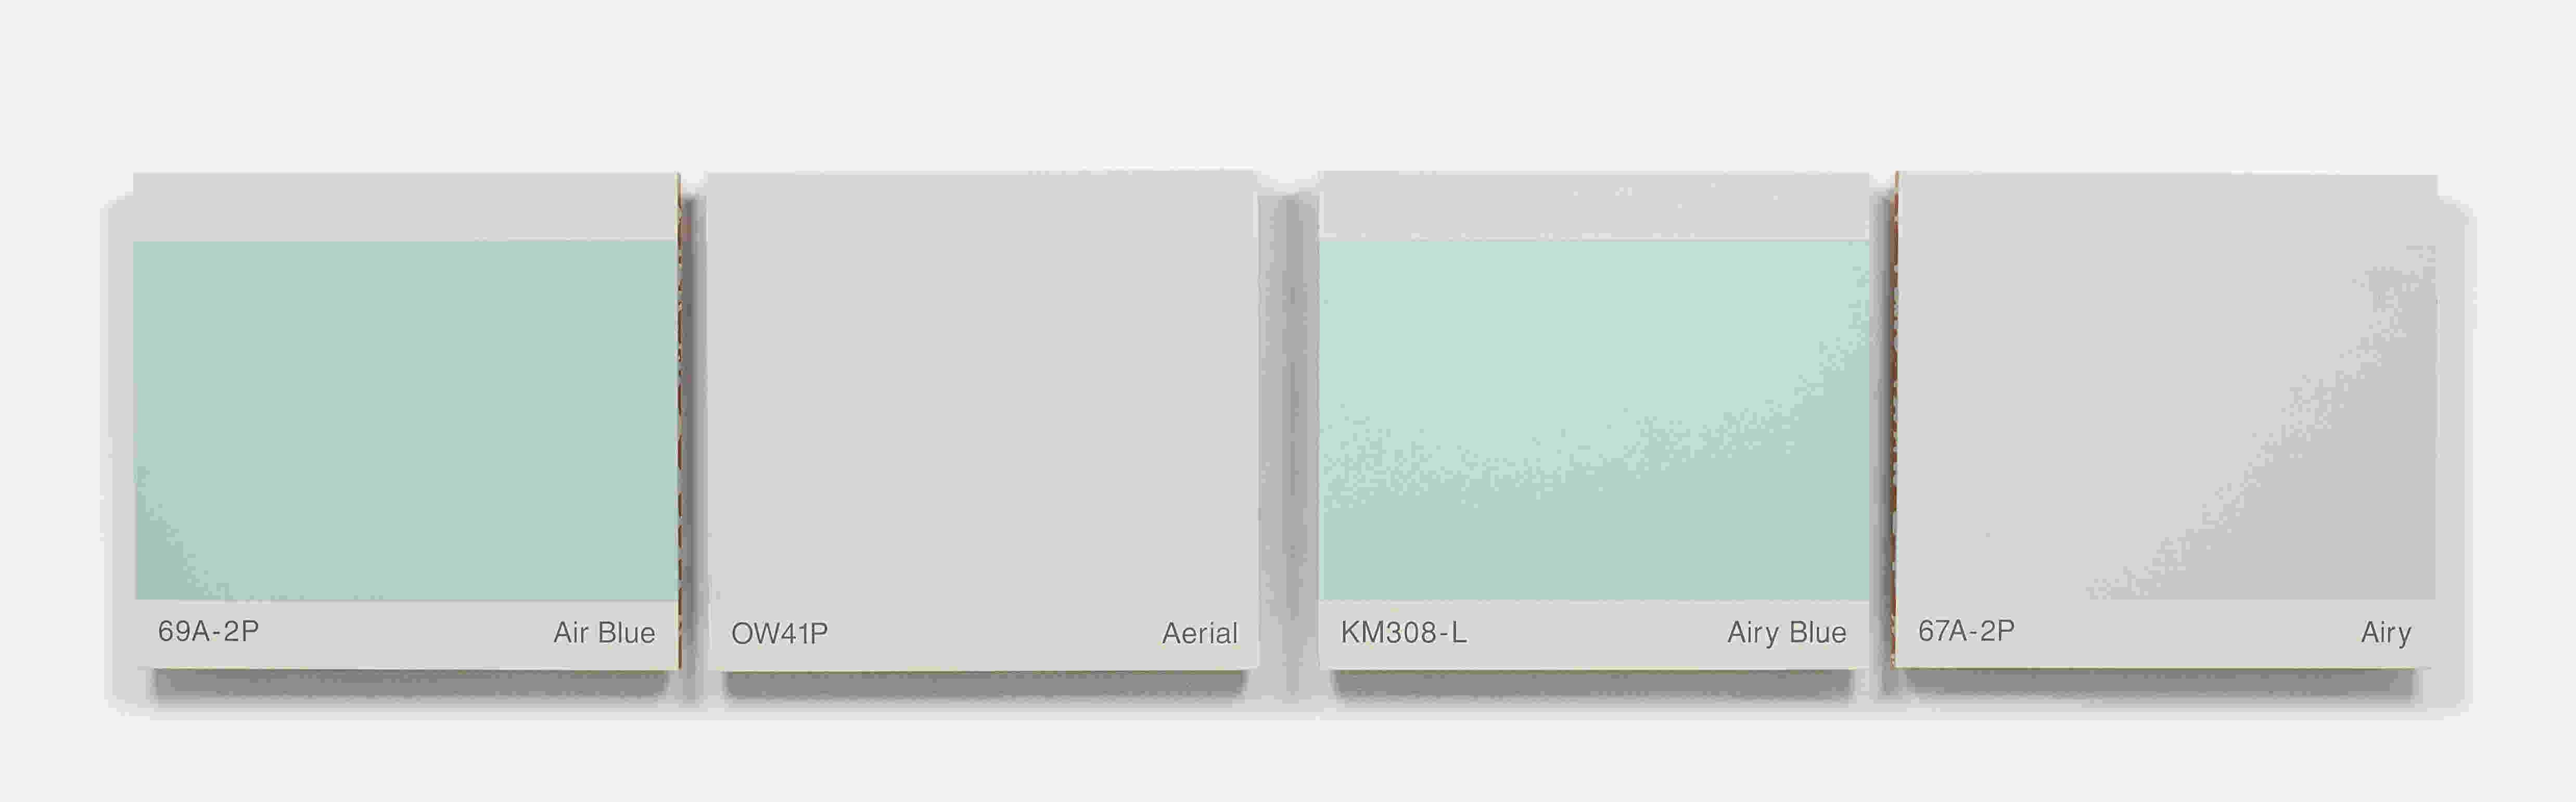 Peter Wegner-Air Blue/Aerial/Airy Blue/Airy-1998